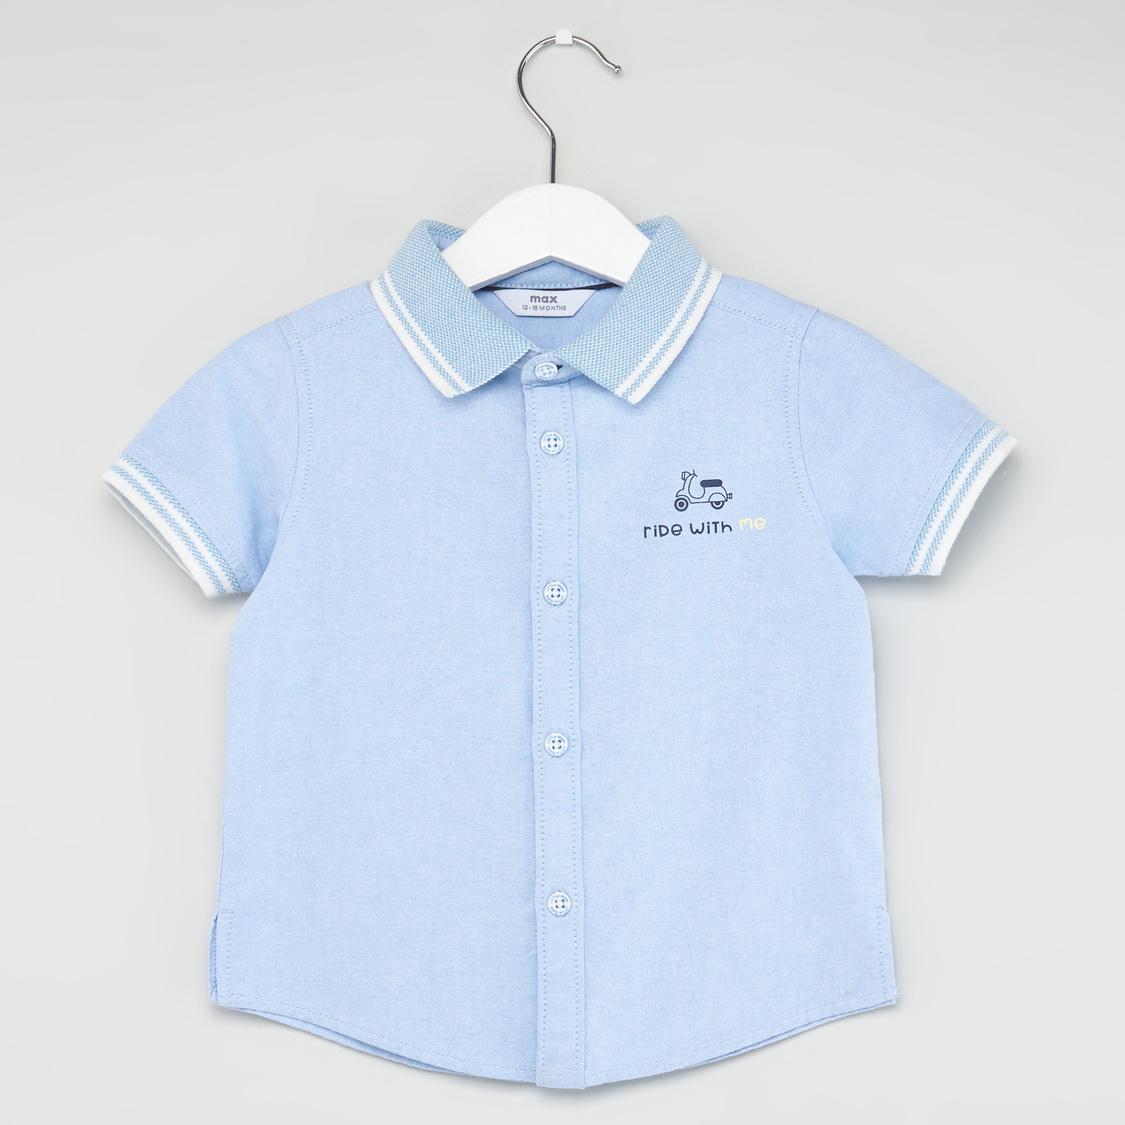 Textured Short Sleeves Shirt with Shorts